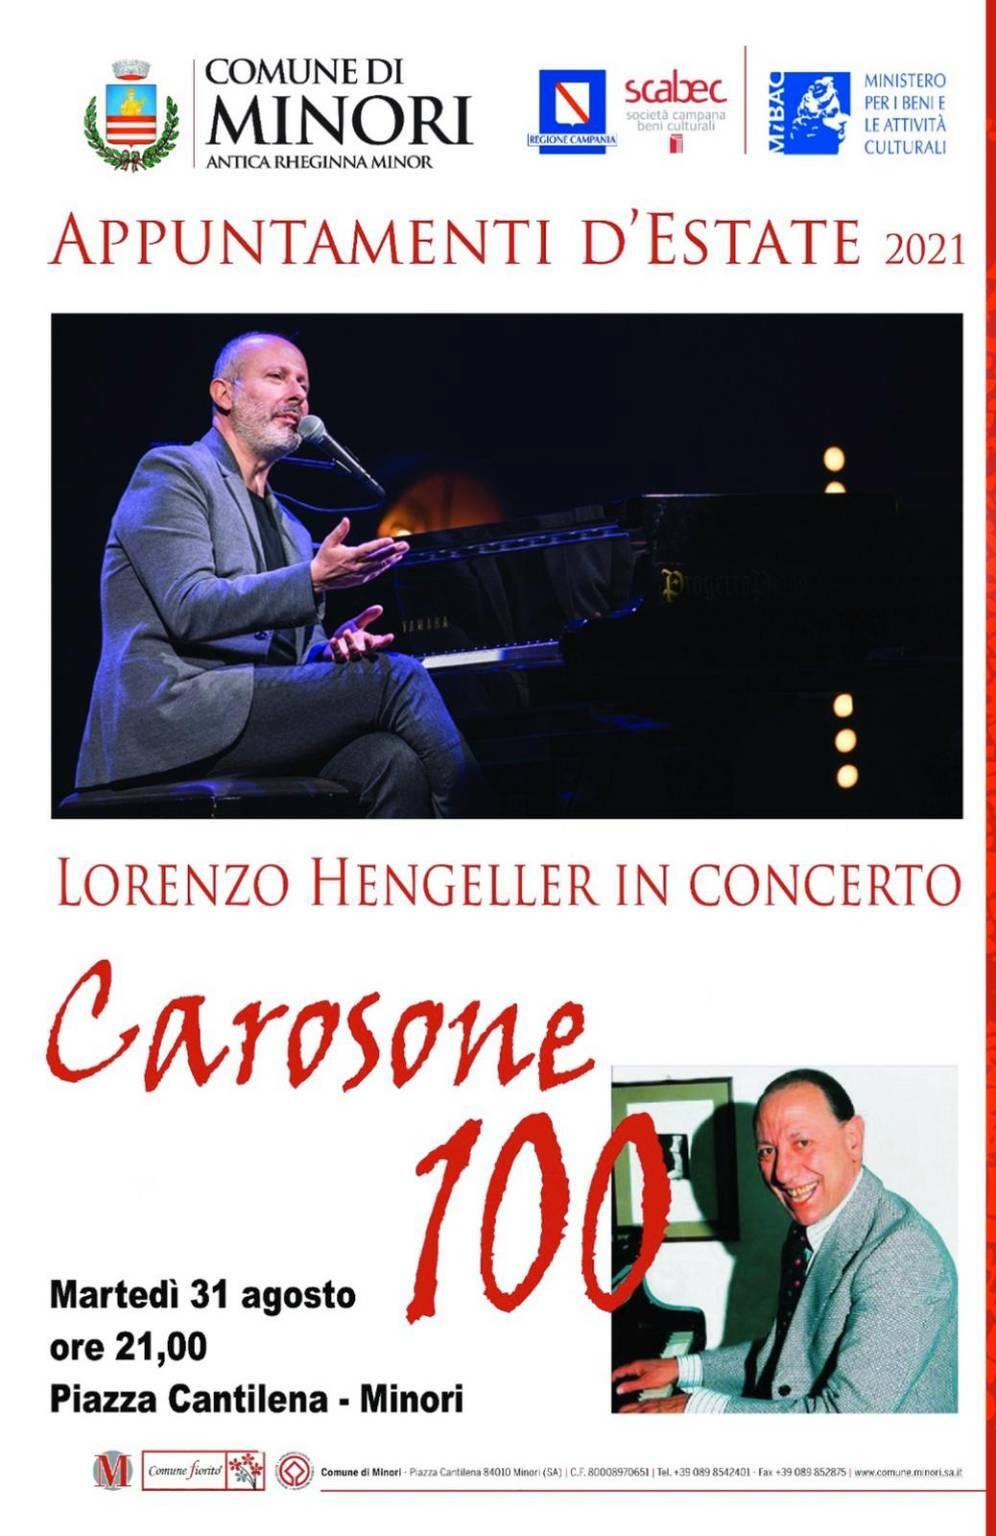 Minori, martedì 31 agosto Lorenzo Hengeller in concerto